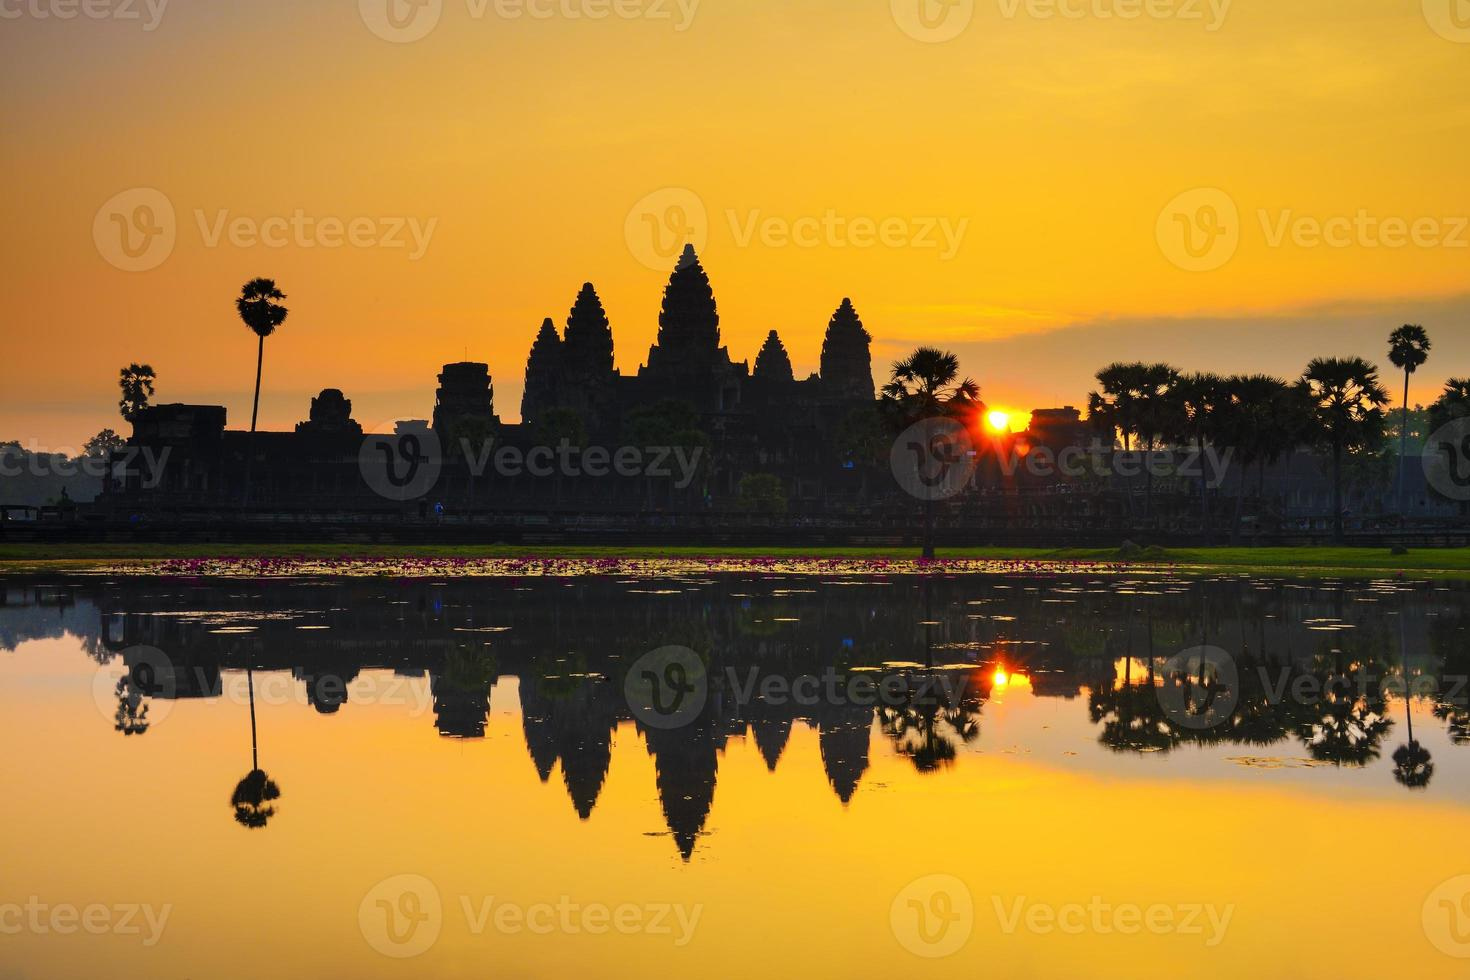 Ankor Wat, Foto bei Sonnenaufgang aufgenommen